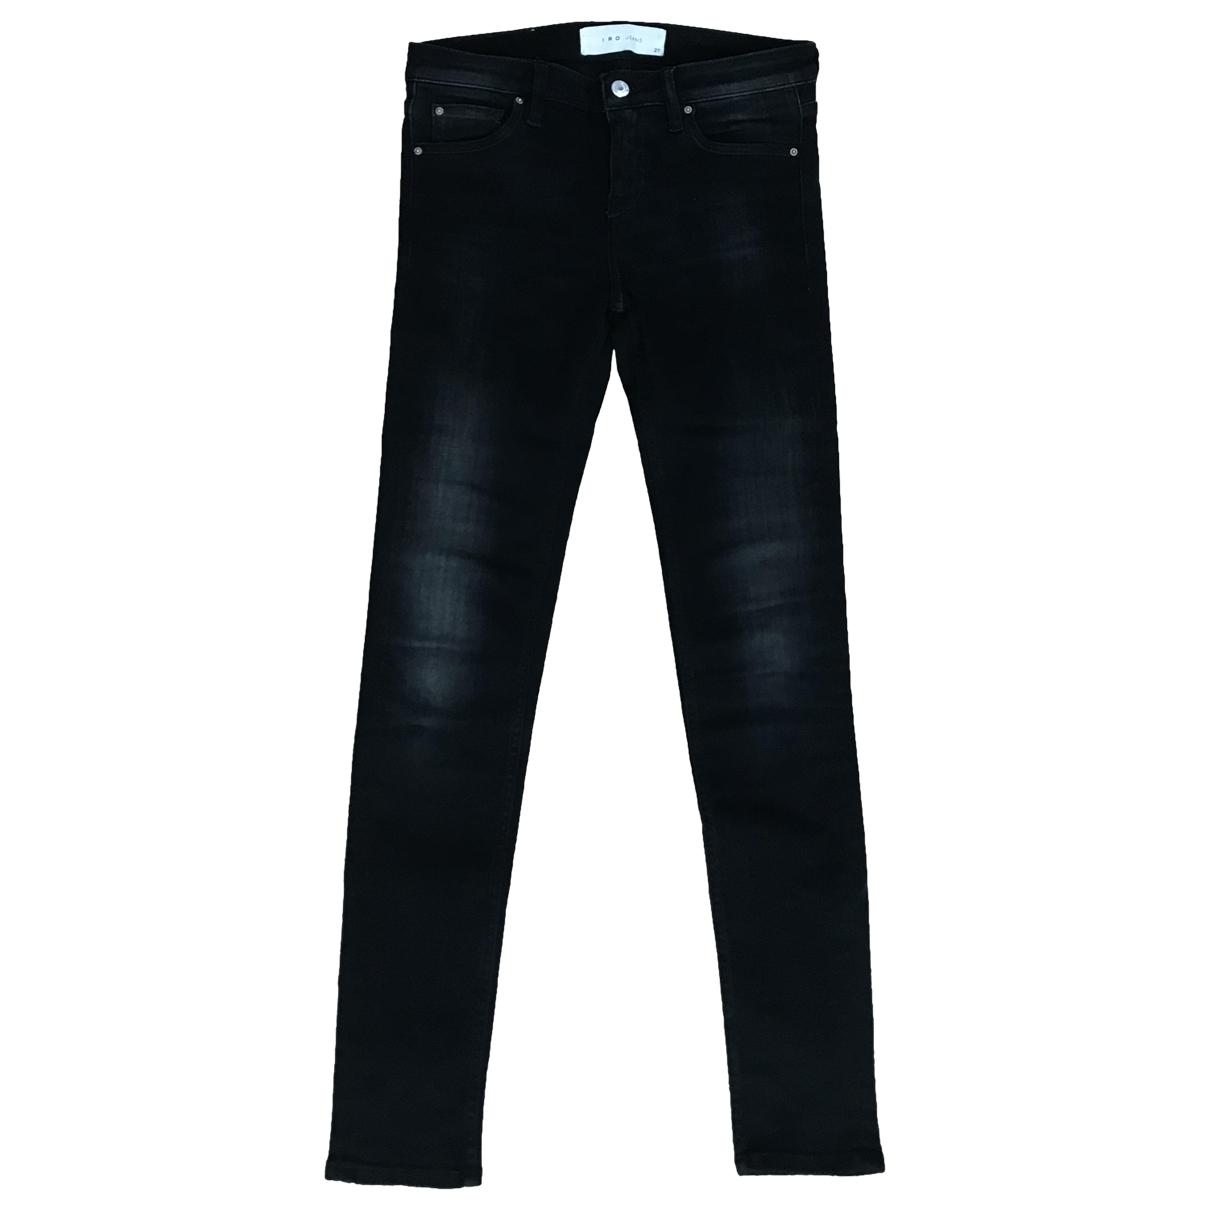 Iro \N Black Cotton - elasthane Jeans for Women 27 US